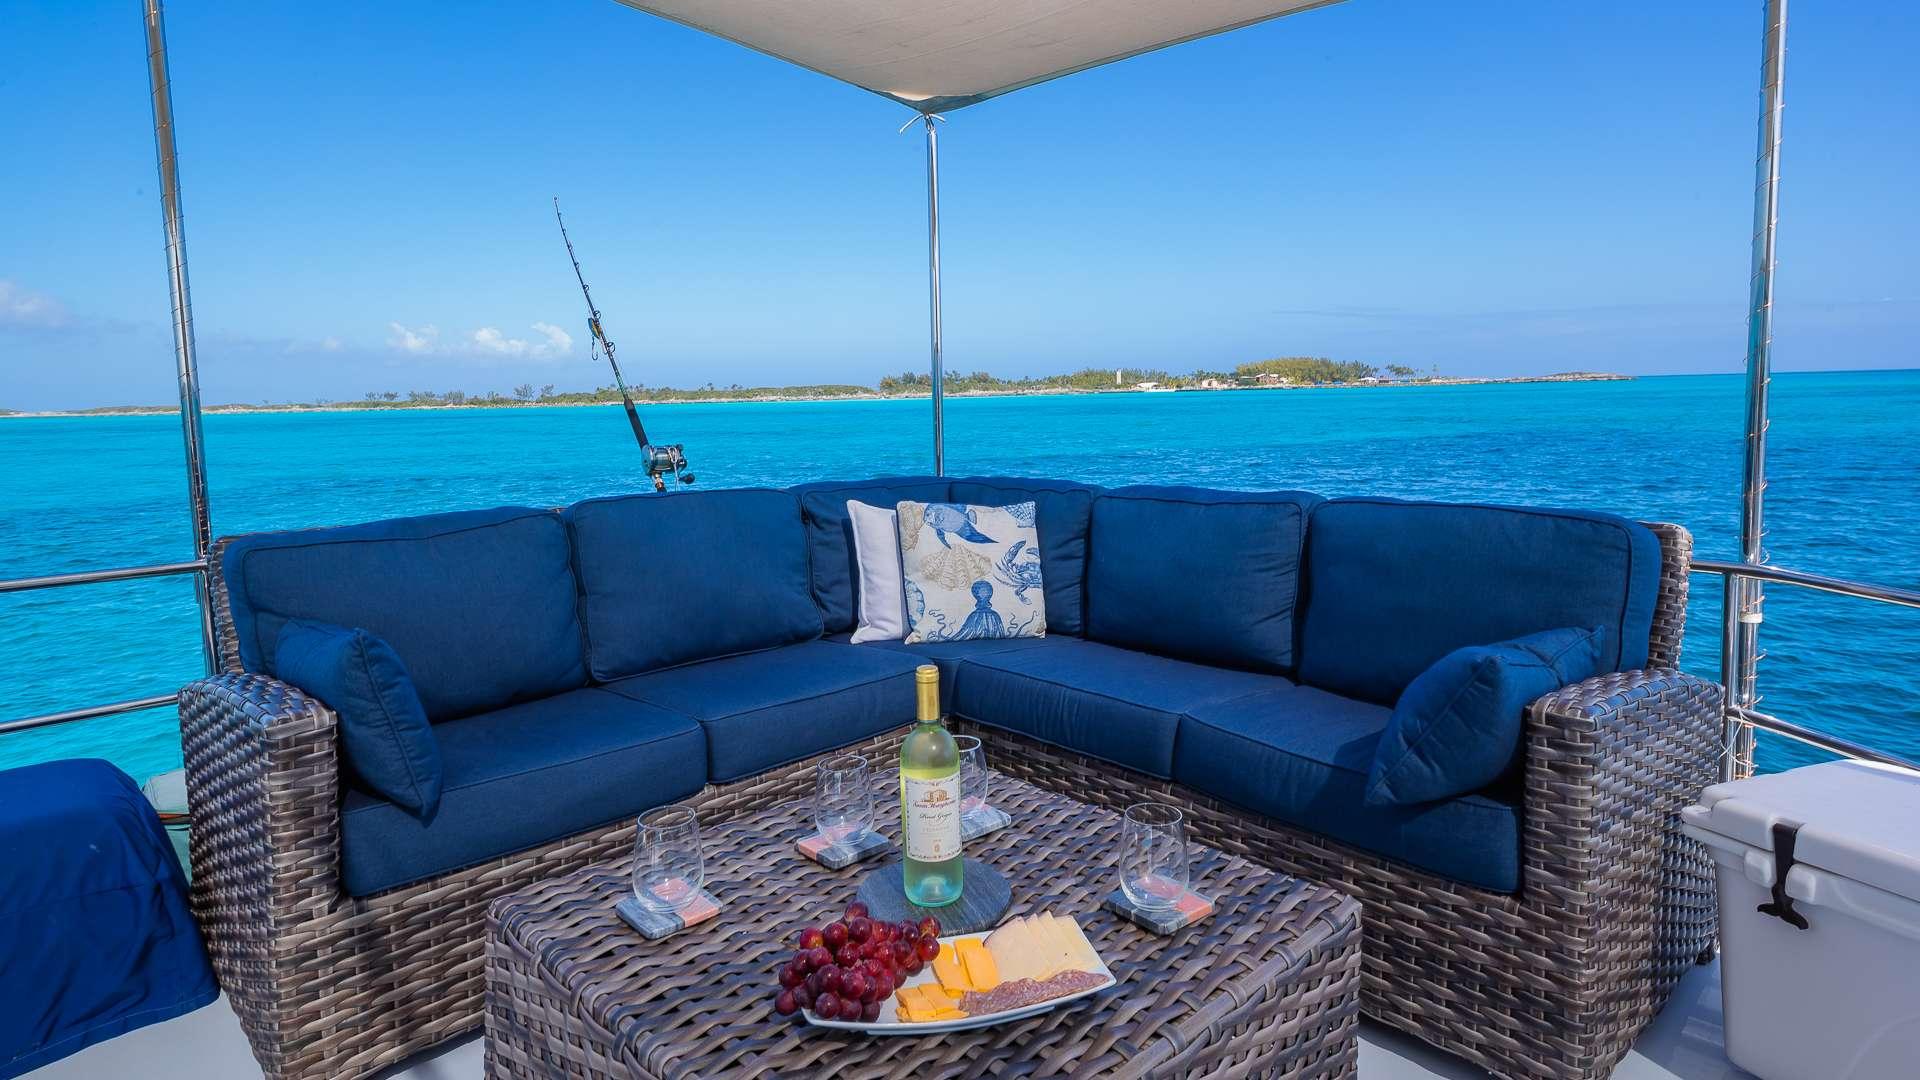 Ariel View Bahamas